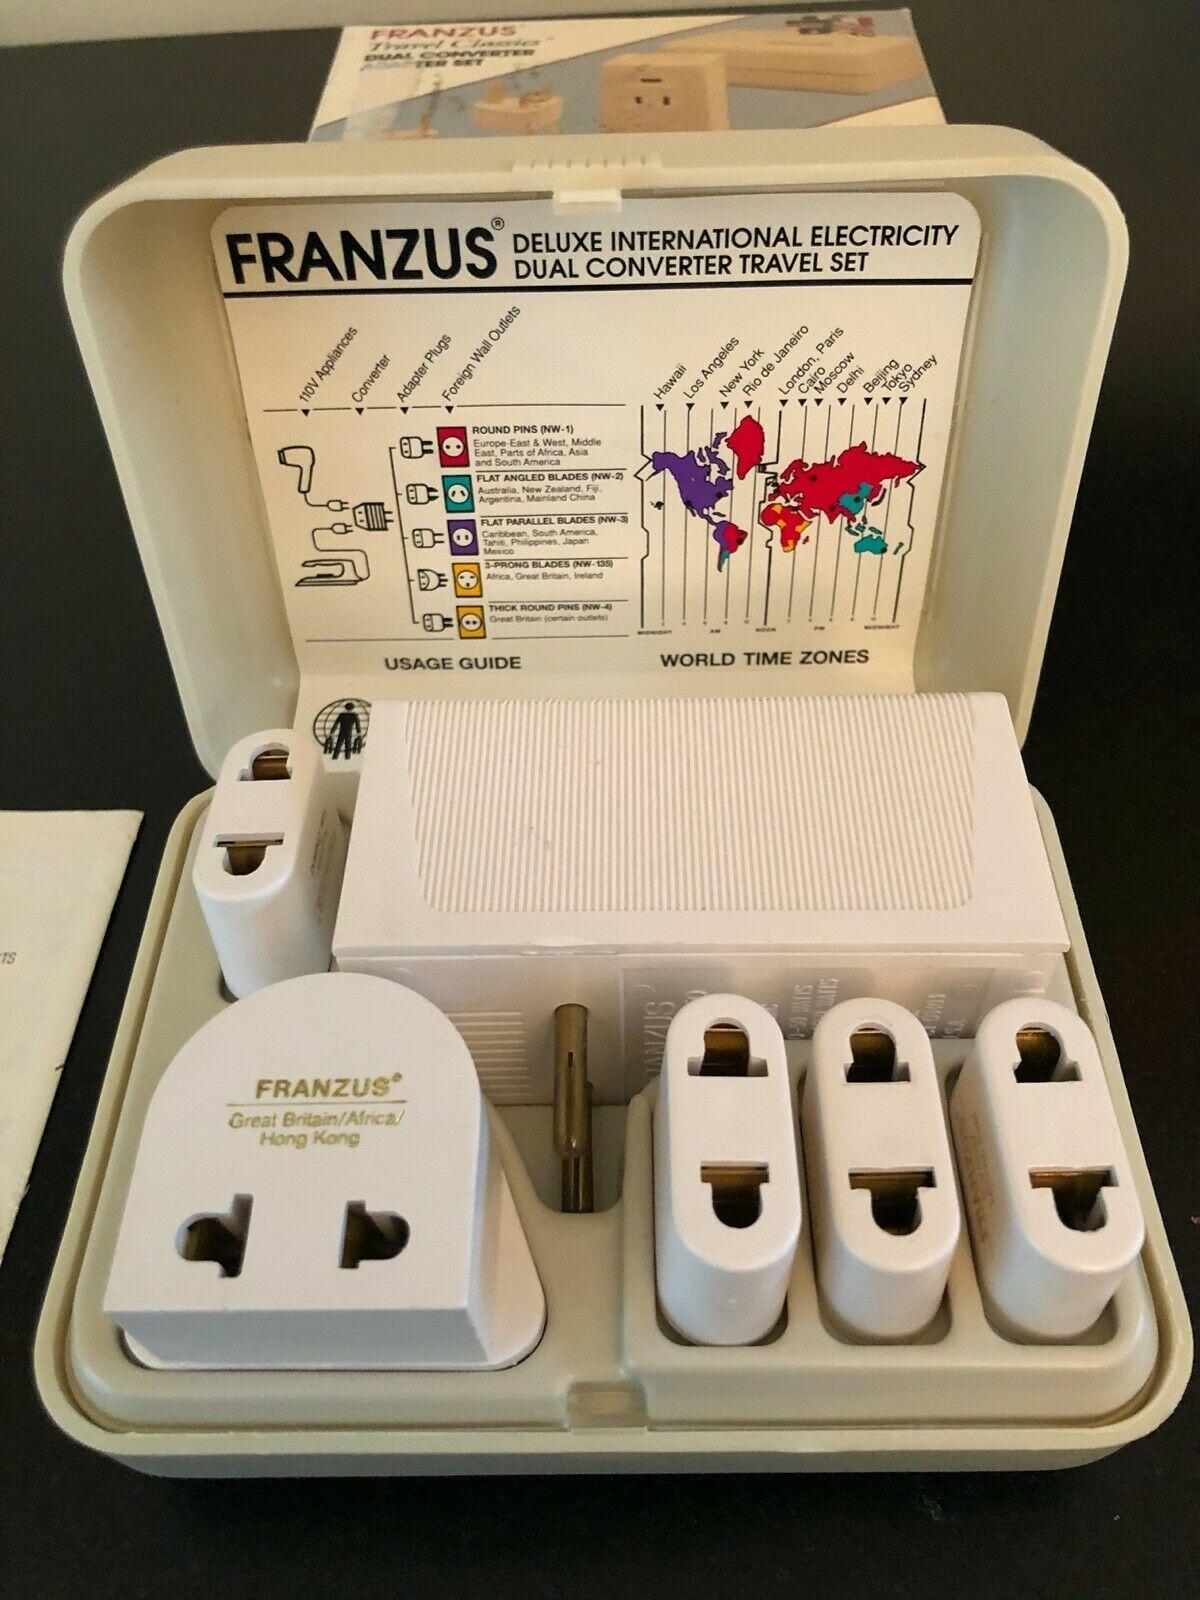 Franzus Travel Worldwide Dual Converter Adapter Set 1650w Model Fr 1650e Ideas Of Travel In 2020 Universal Power Adapter Universal Travel Adapter Universal Adapter